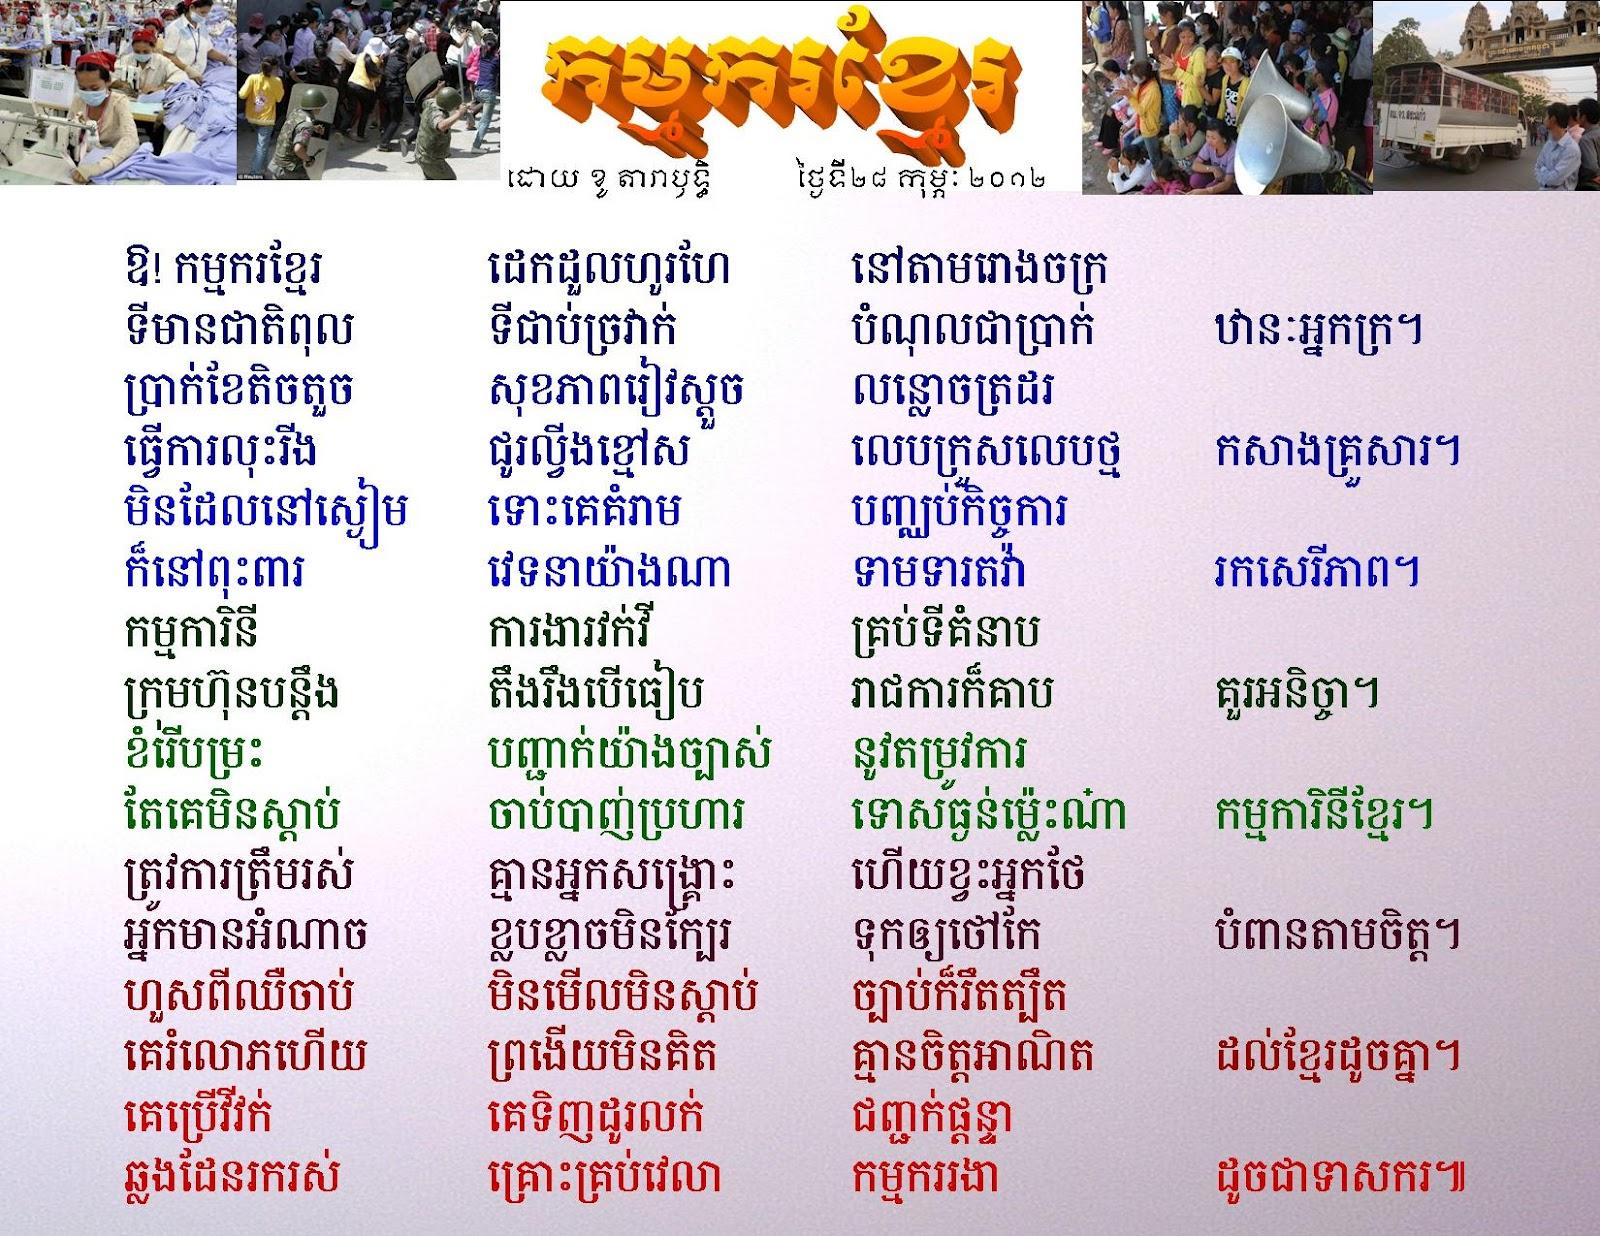 http://4.bp.blogspot.com/-wyZl0DqF7ms/T02XHa9X7hI/AAAAAAAADSc/eldrjIuJljU/s1600/Kamma-kor+Khmer.jpg